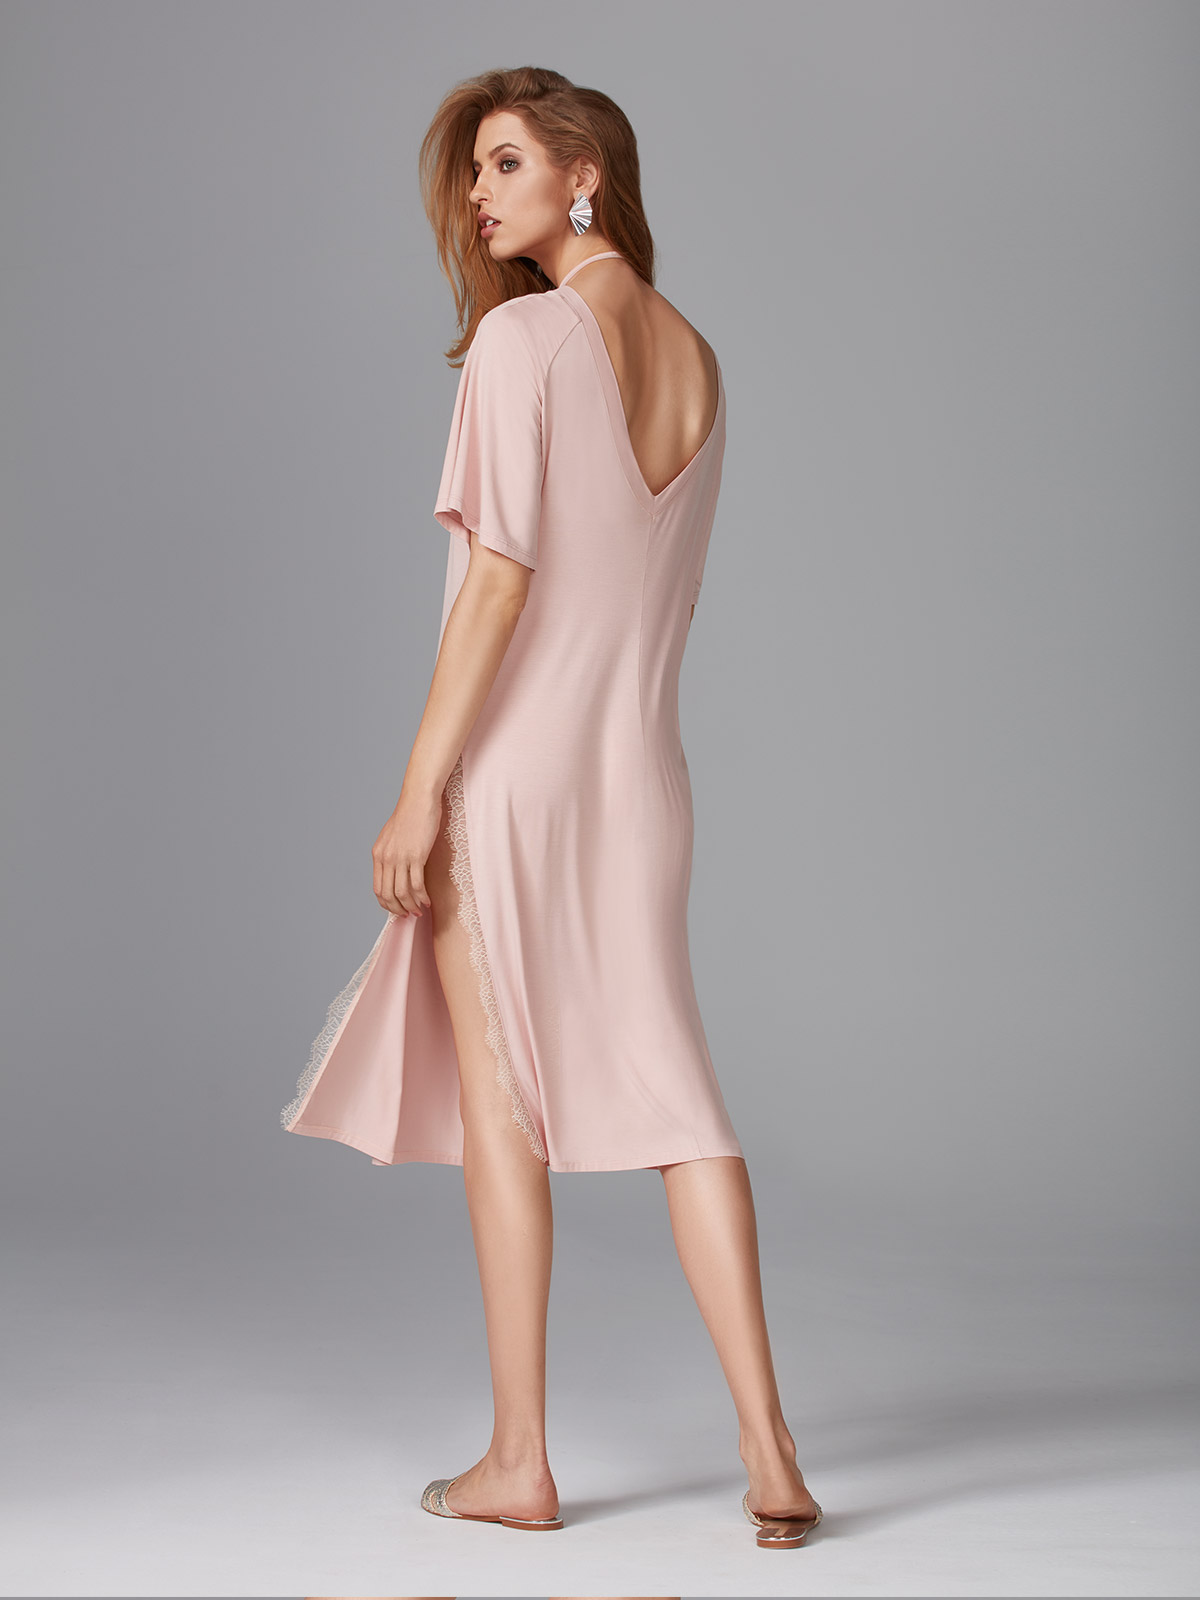 Morning Elegance OZ027 Camicia da notte<br />02 Black, 64 Dusty Pink